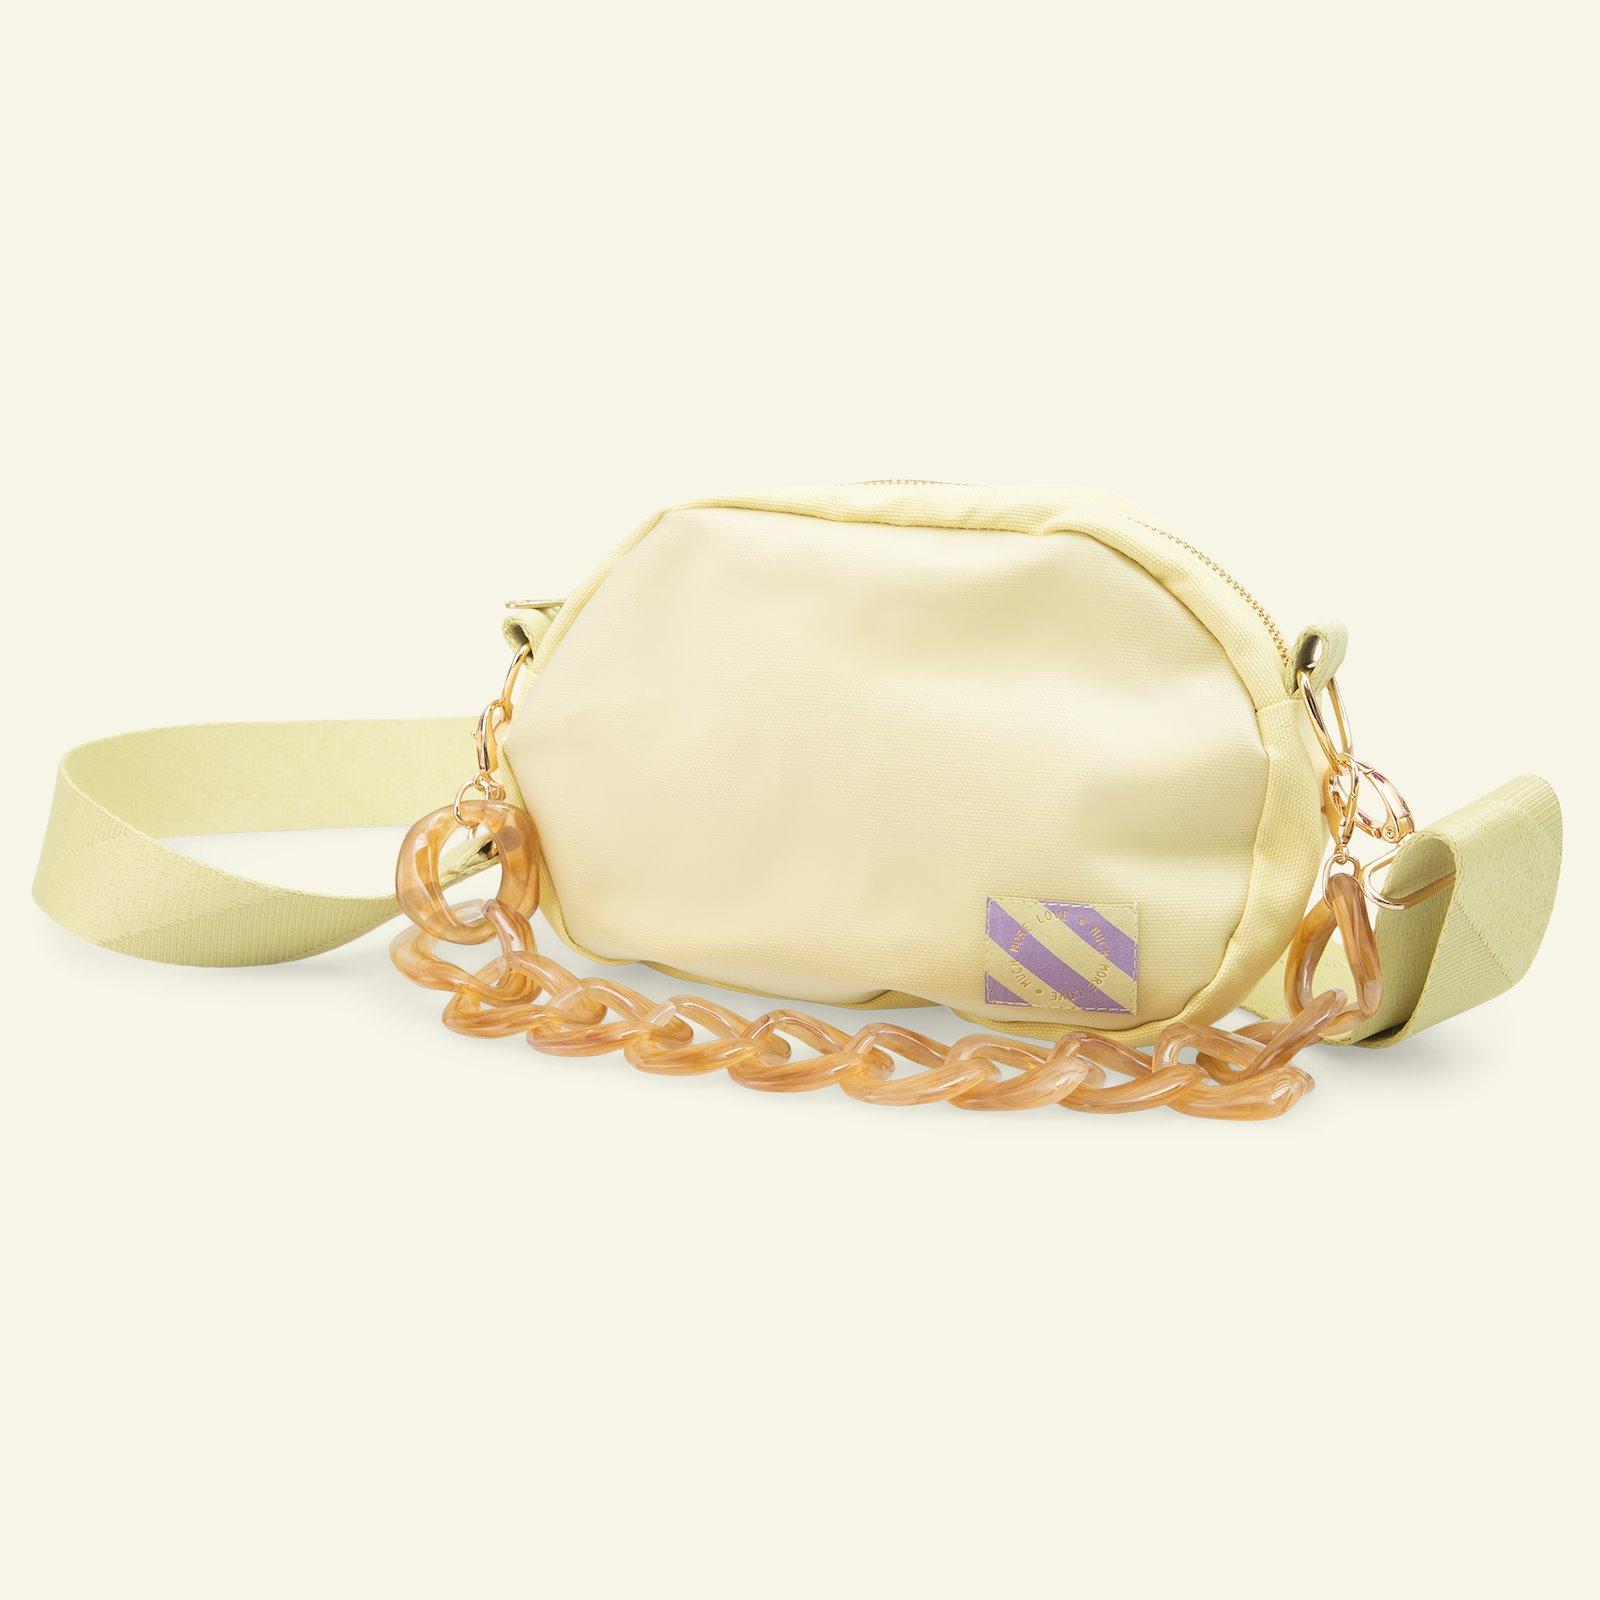 Chain handle 53cm caramel 1pc p90318_780480_95597_82407_46302_45519_45506_45523_z59344_26503_sskit